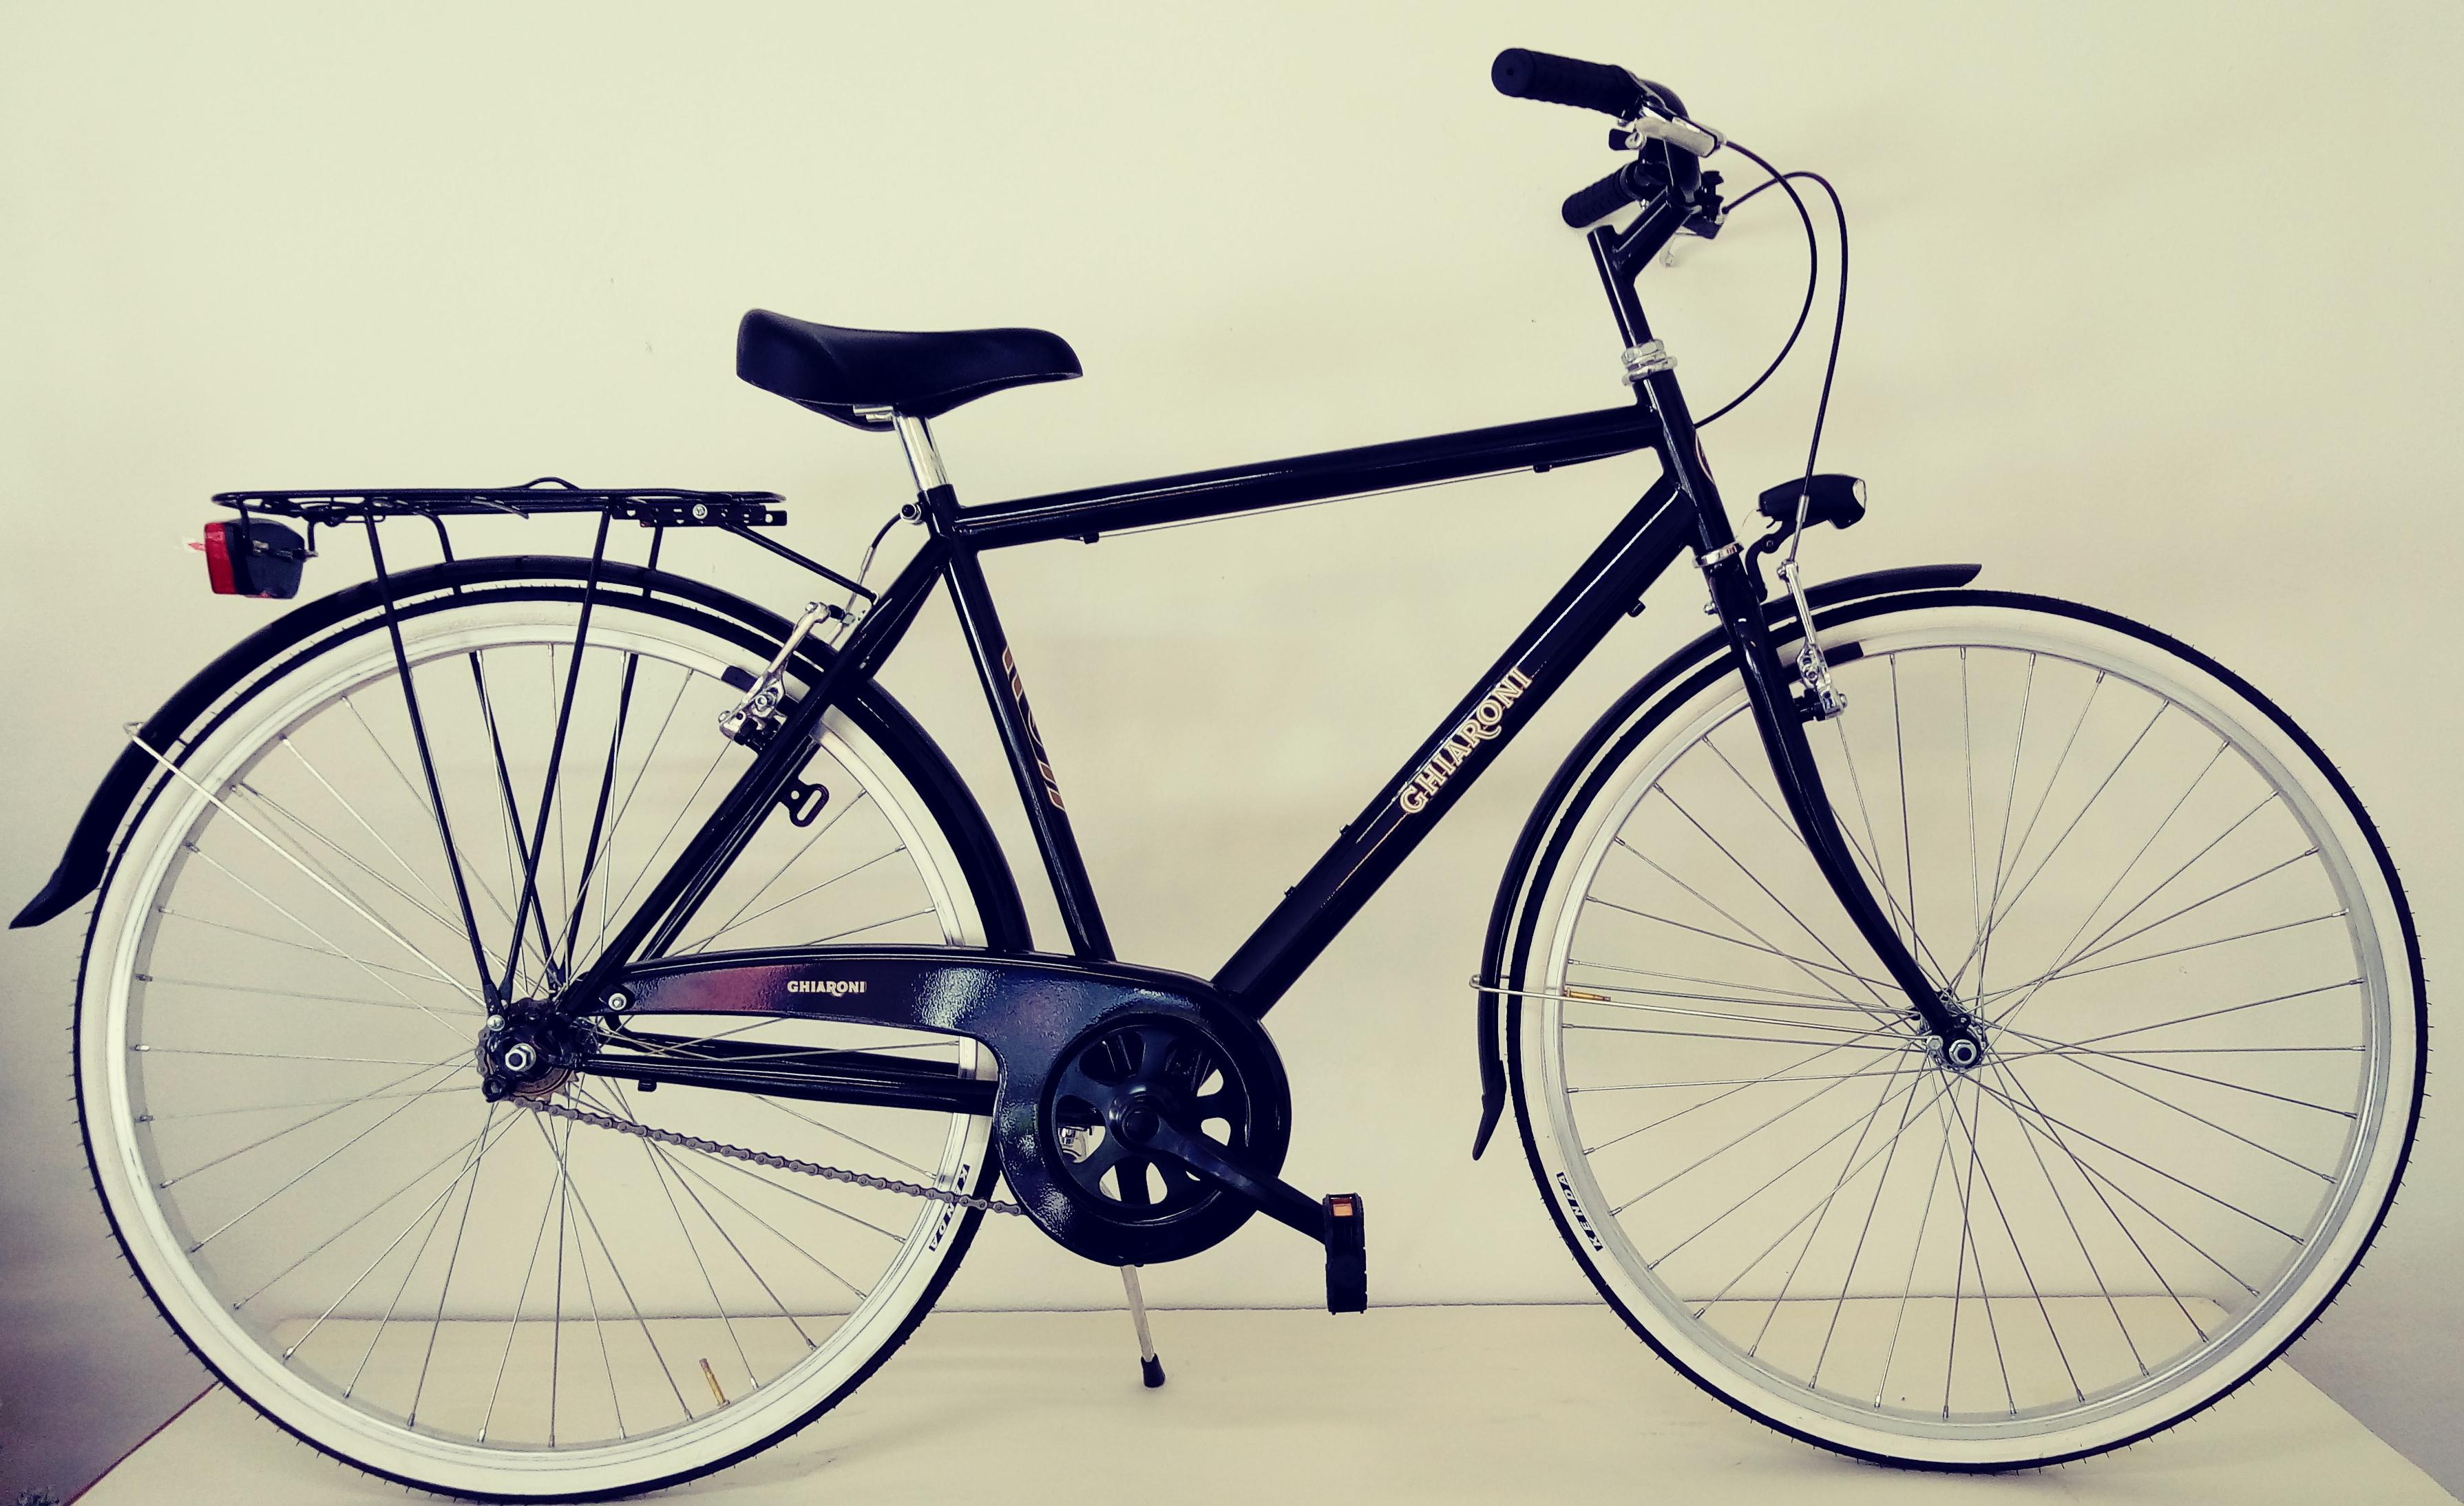 Eshop Art 0900 Bici Sport Te Uomo 28